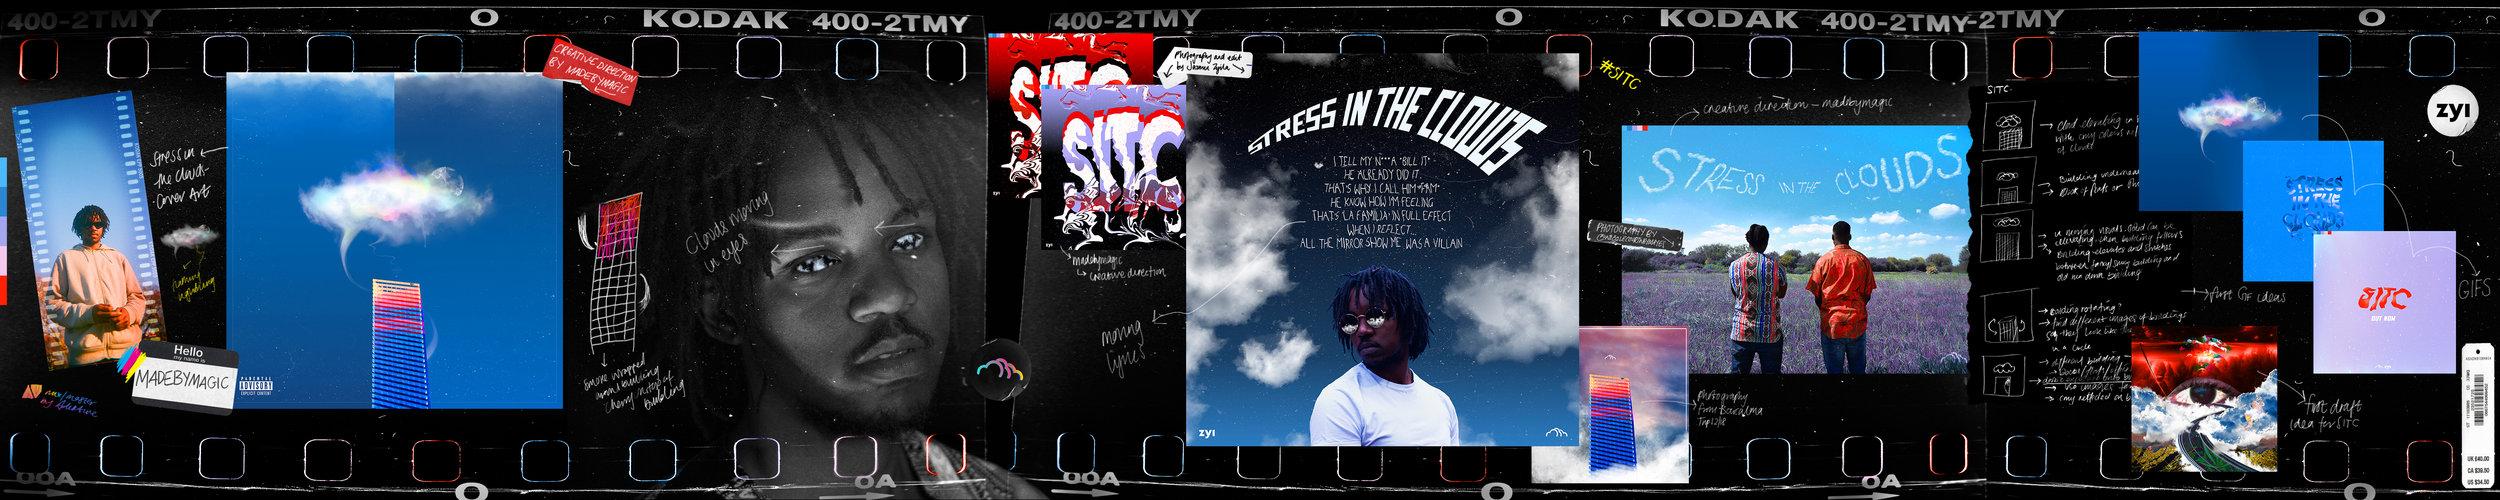 stress_in_the_clouds_moard_TD.jpg